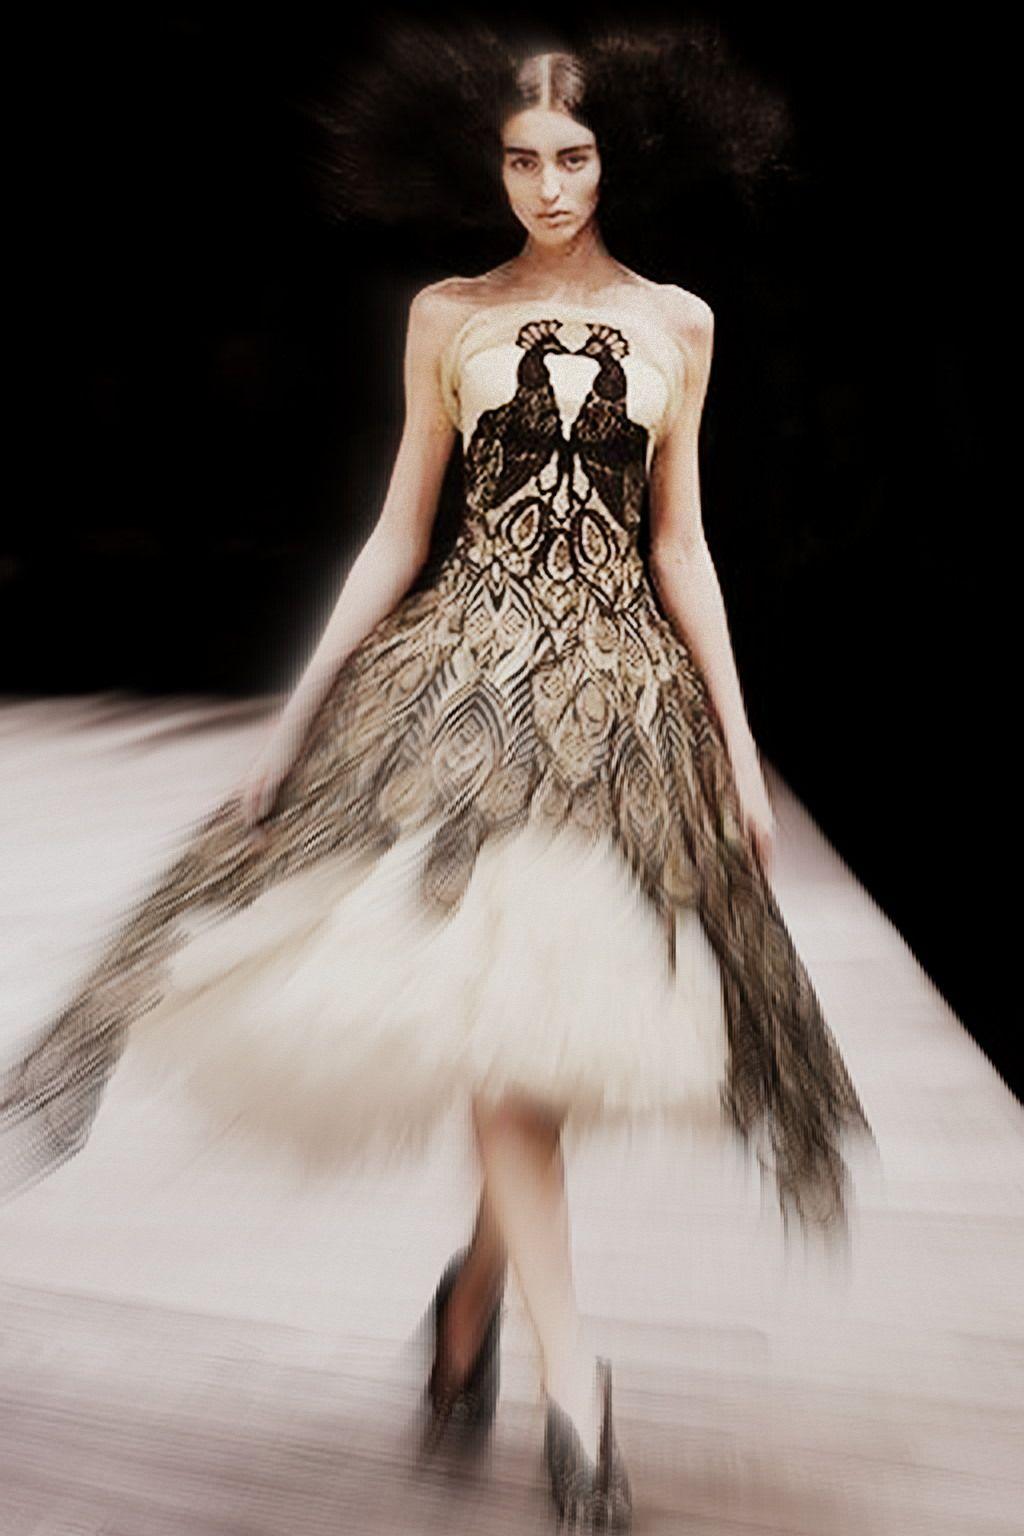 Peacock+Wedding+Dress | Alexander McQueen FW08 Peacock Wedding Gown on Exshoesme.com